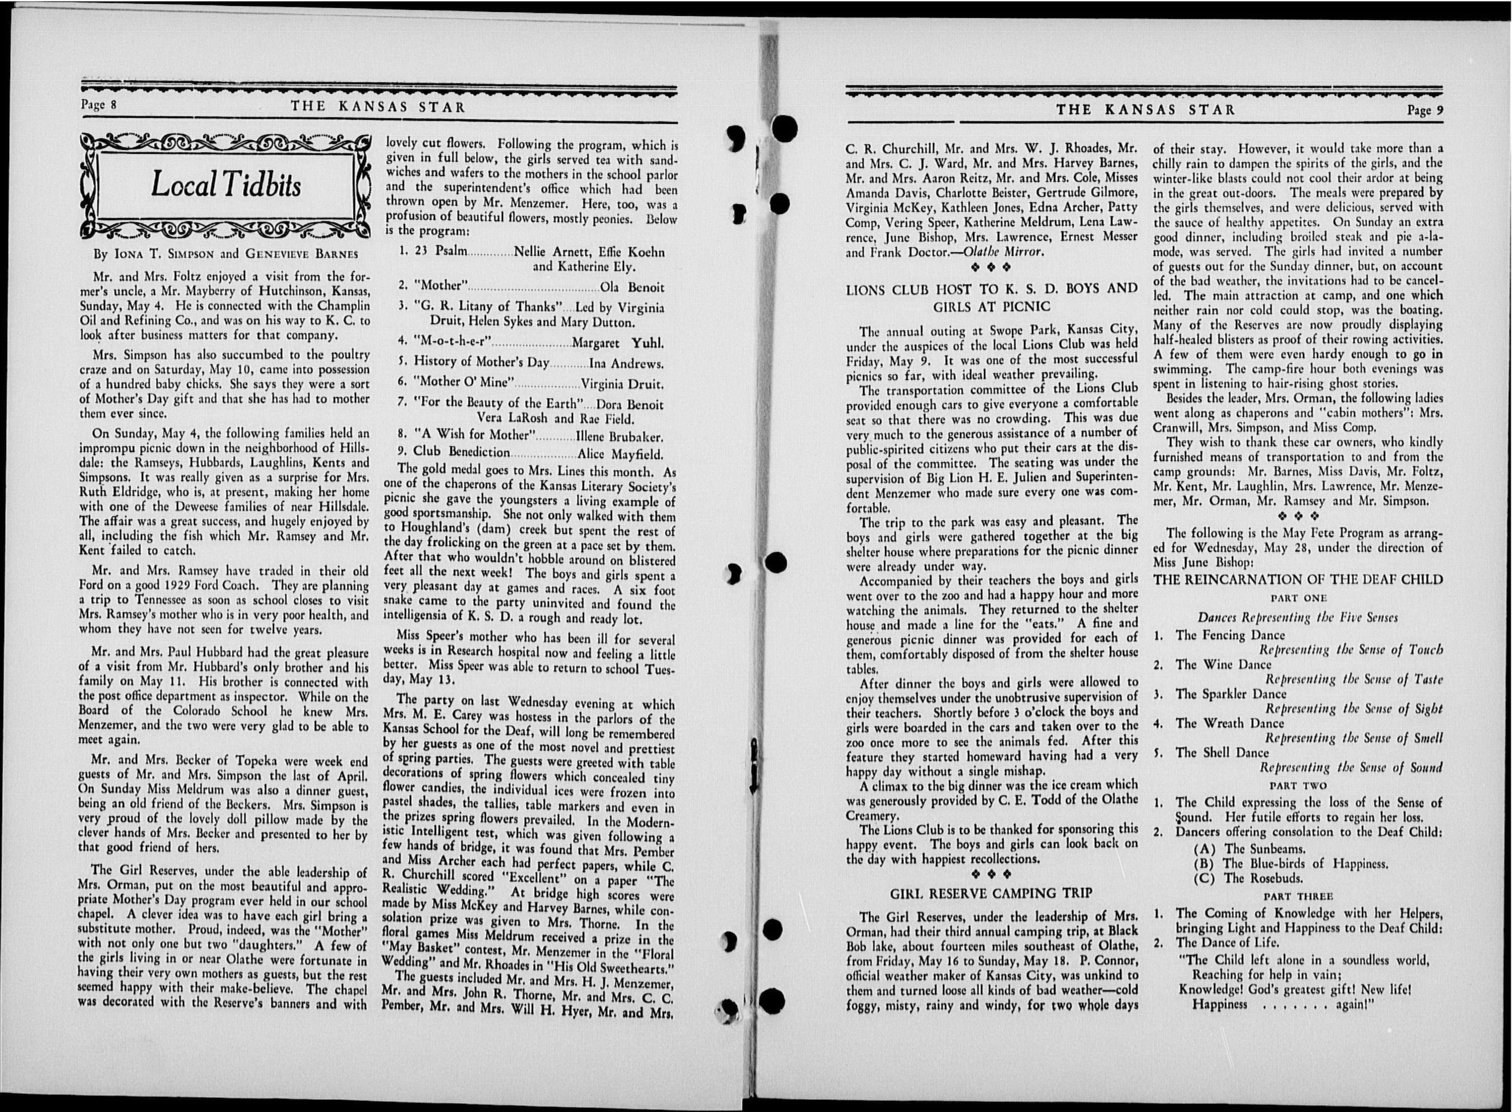 The Kansas Star, volume 53, number 9 - 8-9